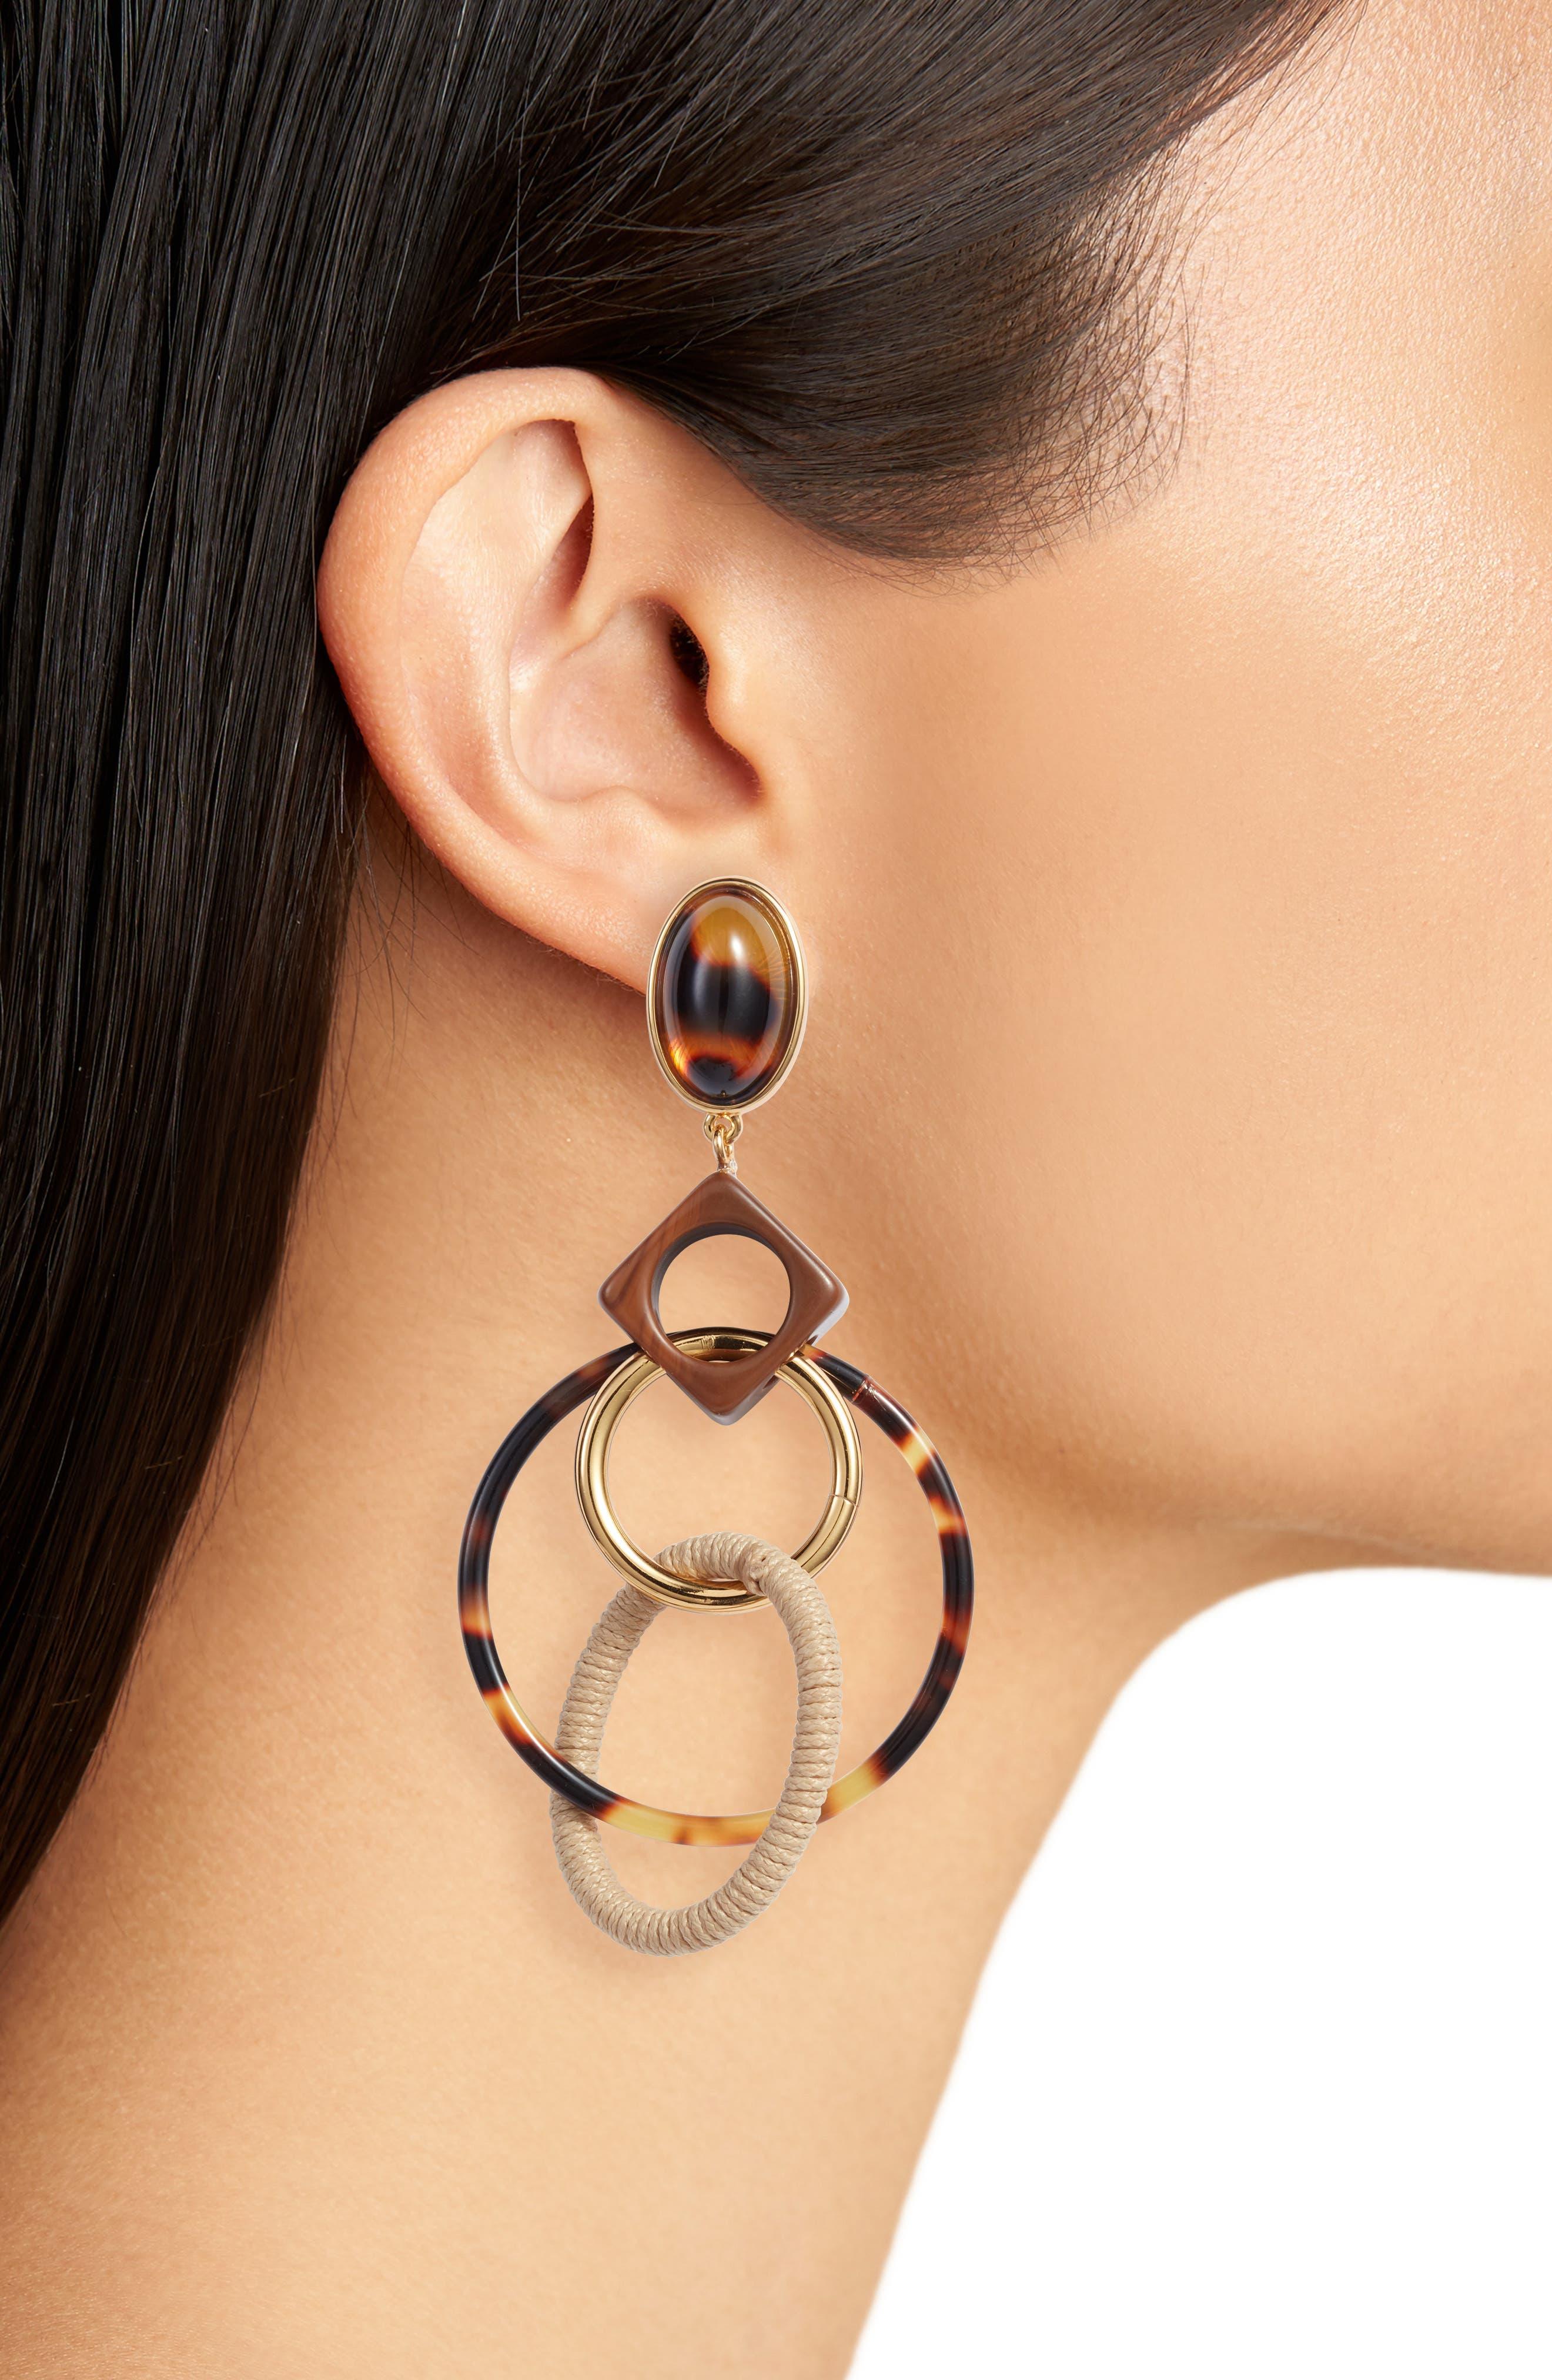 Spinning Hoop Earrings,                             Alternate thumbnail 2, color,                             710